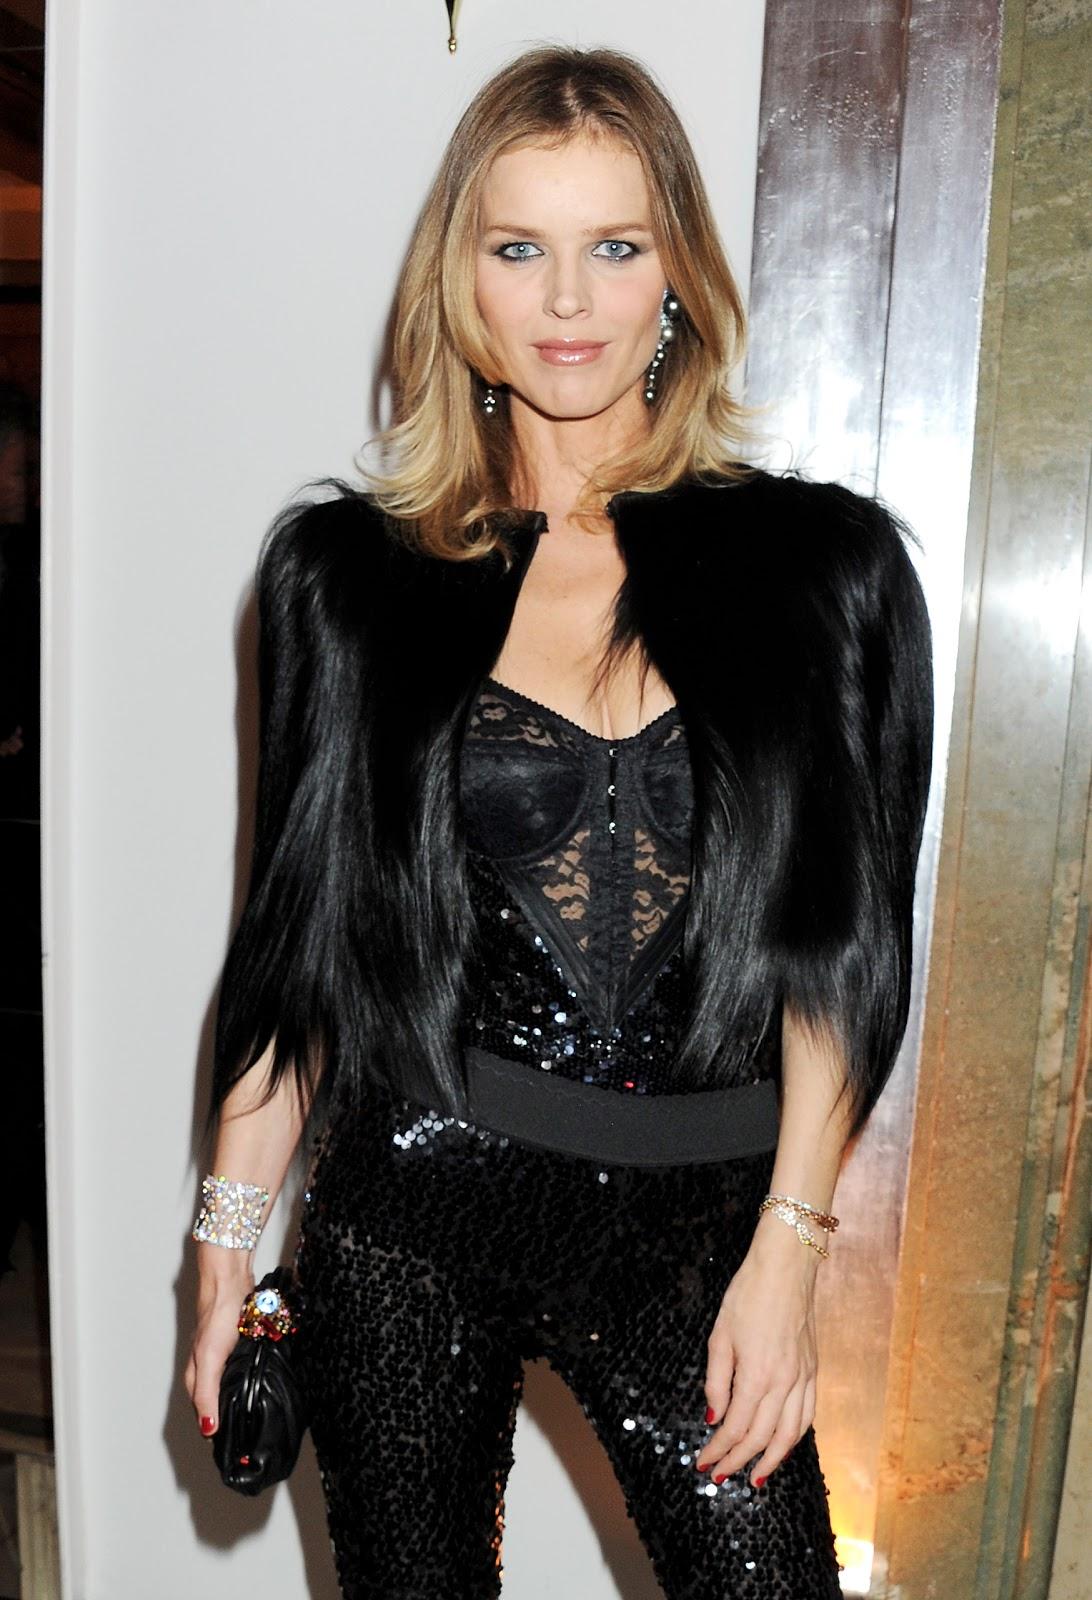 http://3.bp.blogspot.com/-HibsvNYJ4Po/Tr7LaS-mO_I/AAAAAAAAePk/hMN5aKwQfic/s1600/Eva+Herzigova+Harper%2527s+Bazaar+Awards+2011.jpg